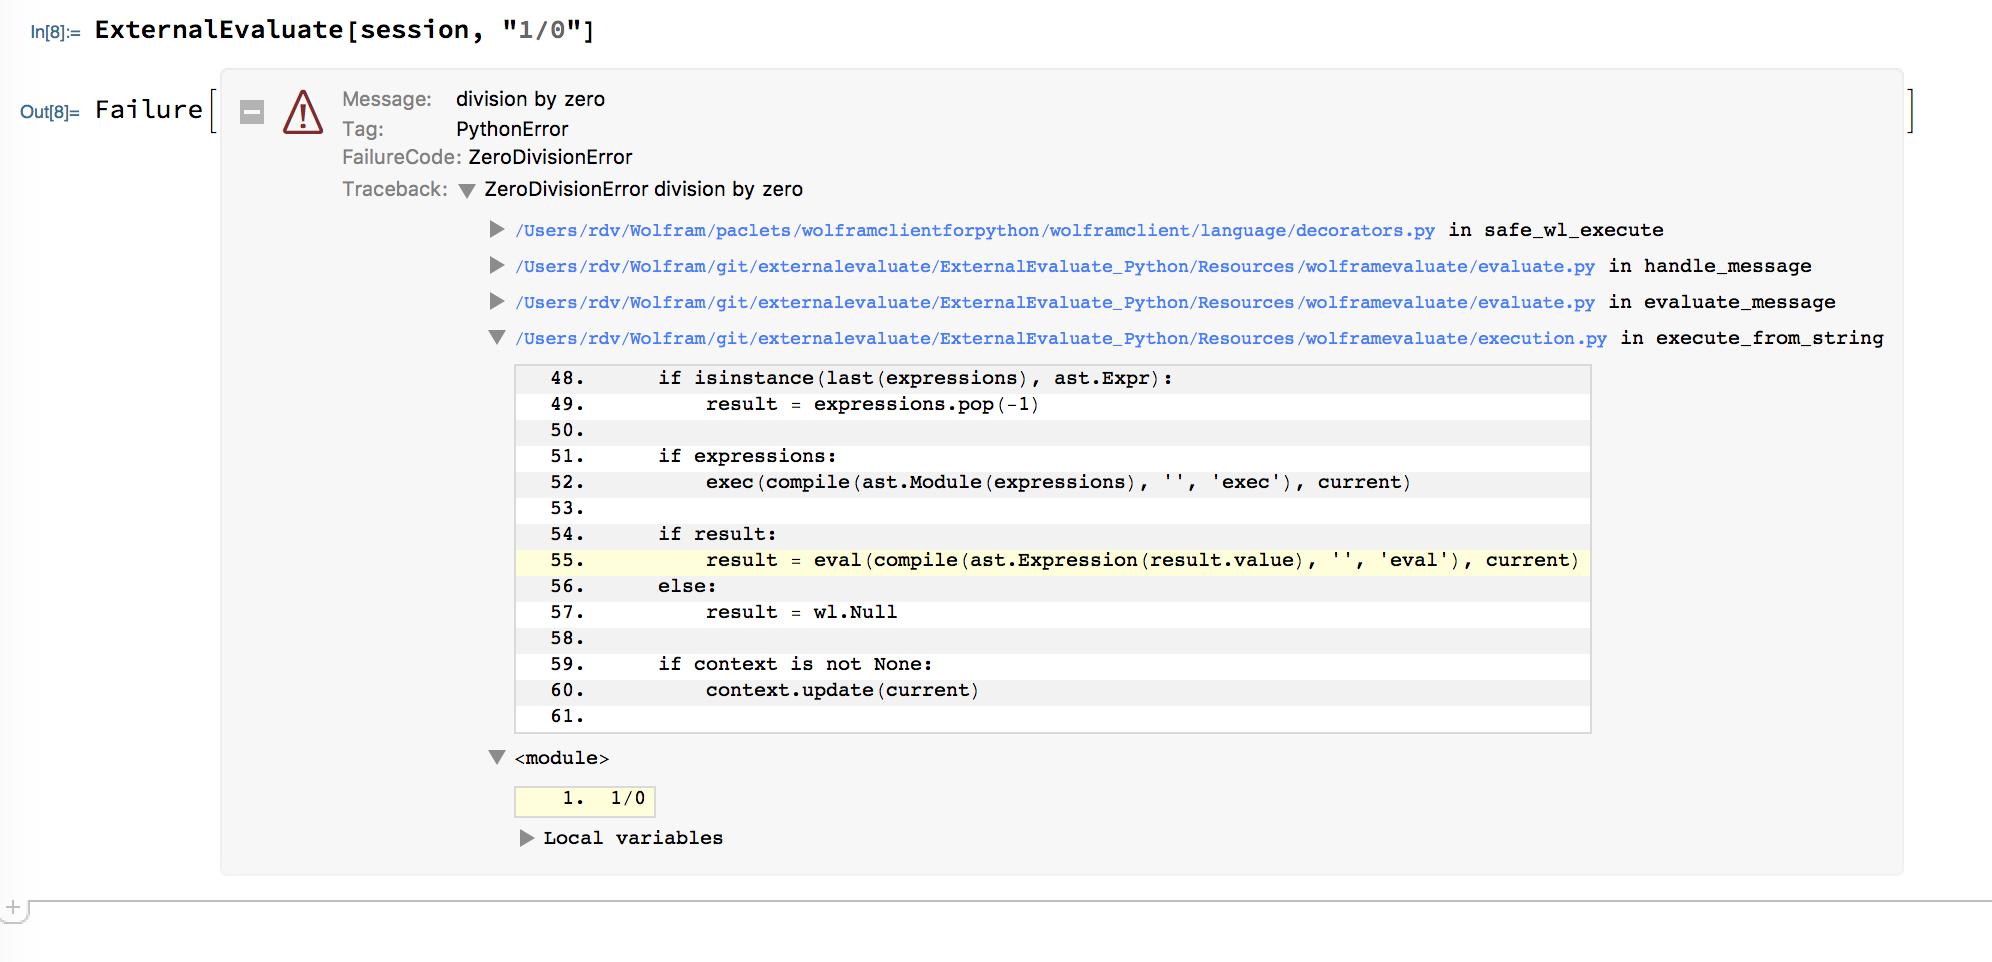 Python traceback